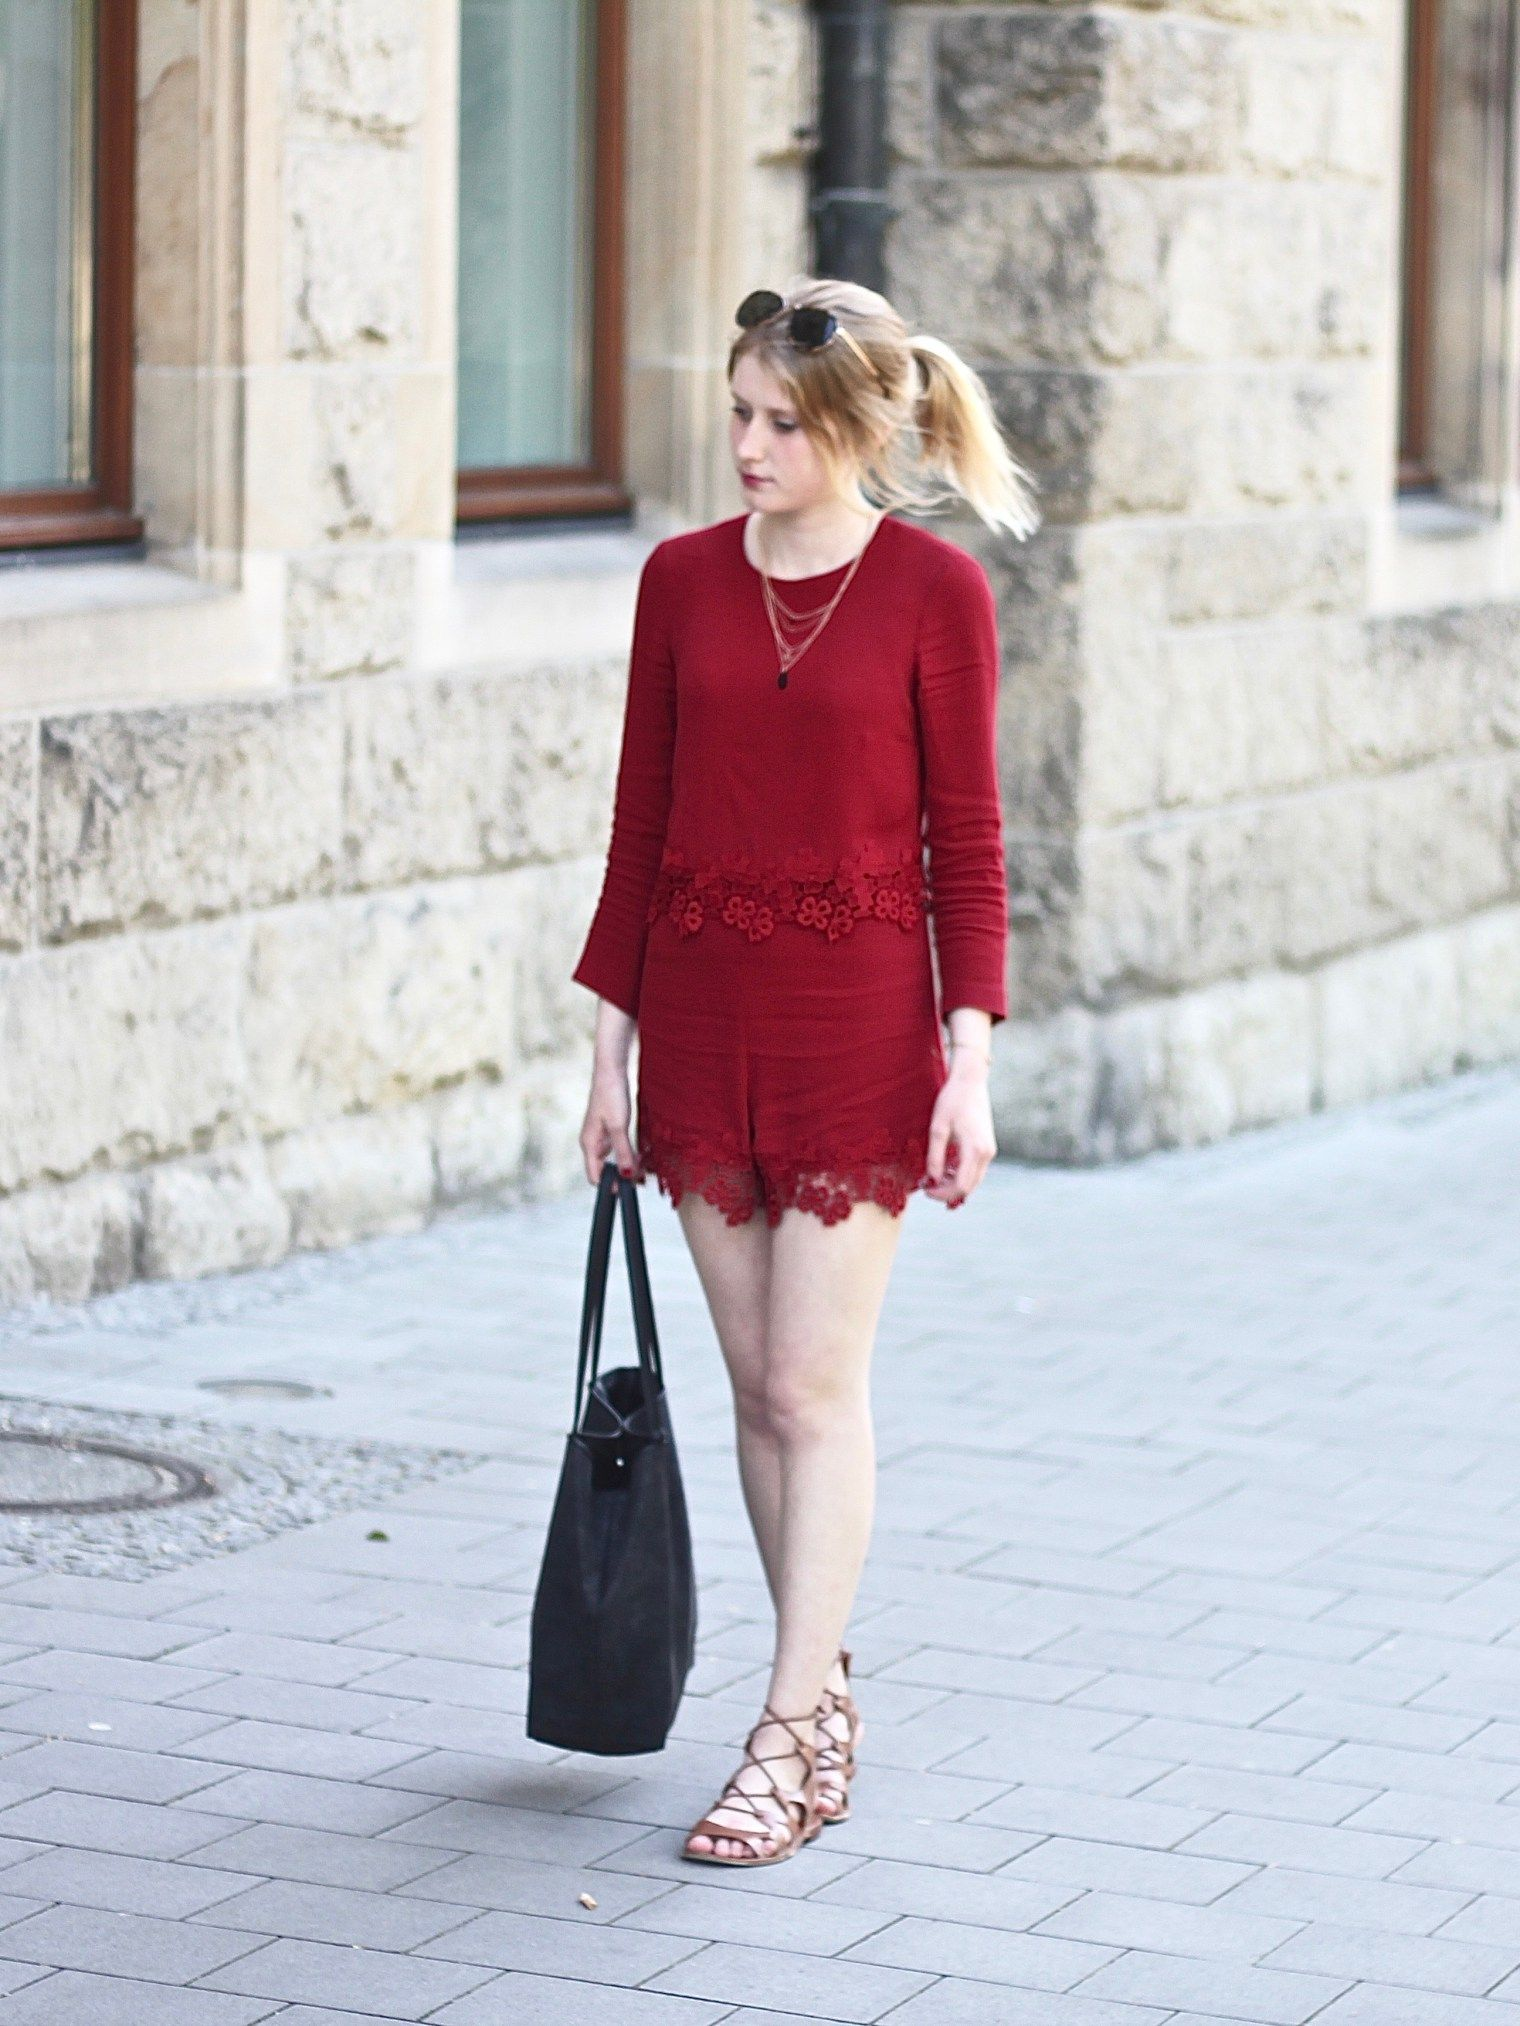 fec2366eb1cef0 roter Jumpsuit mit Spitze - katiys.com | Fashion | Rot, Spitze